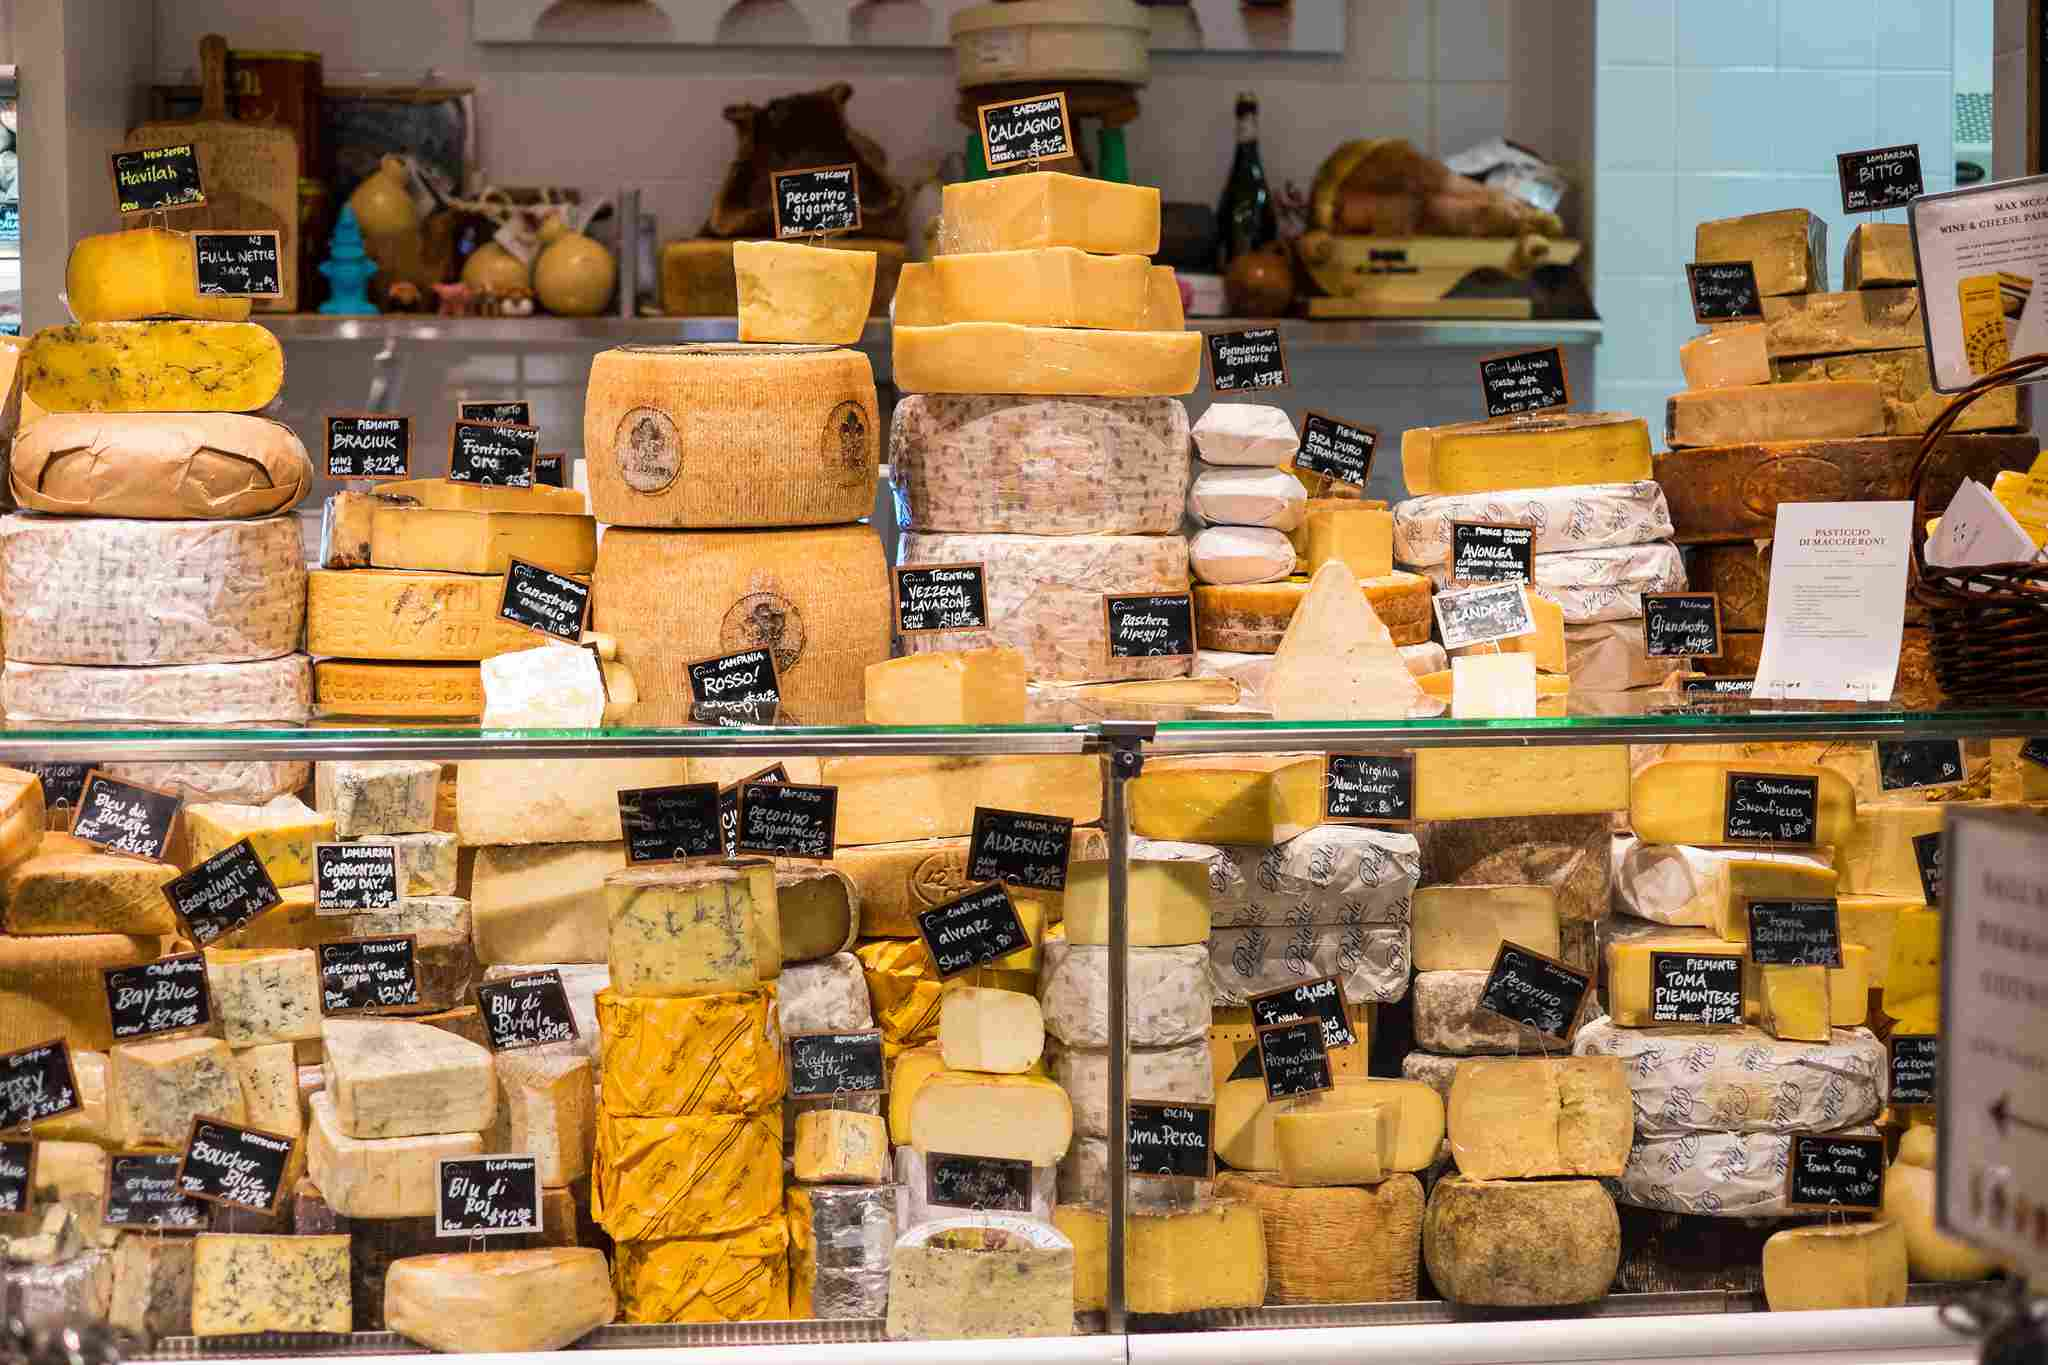 Exhibición de queso en Eataly